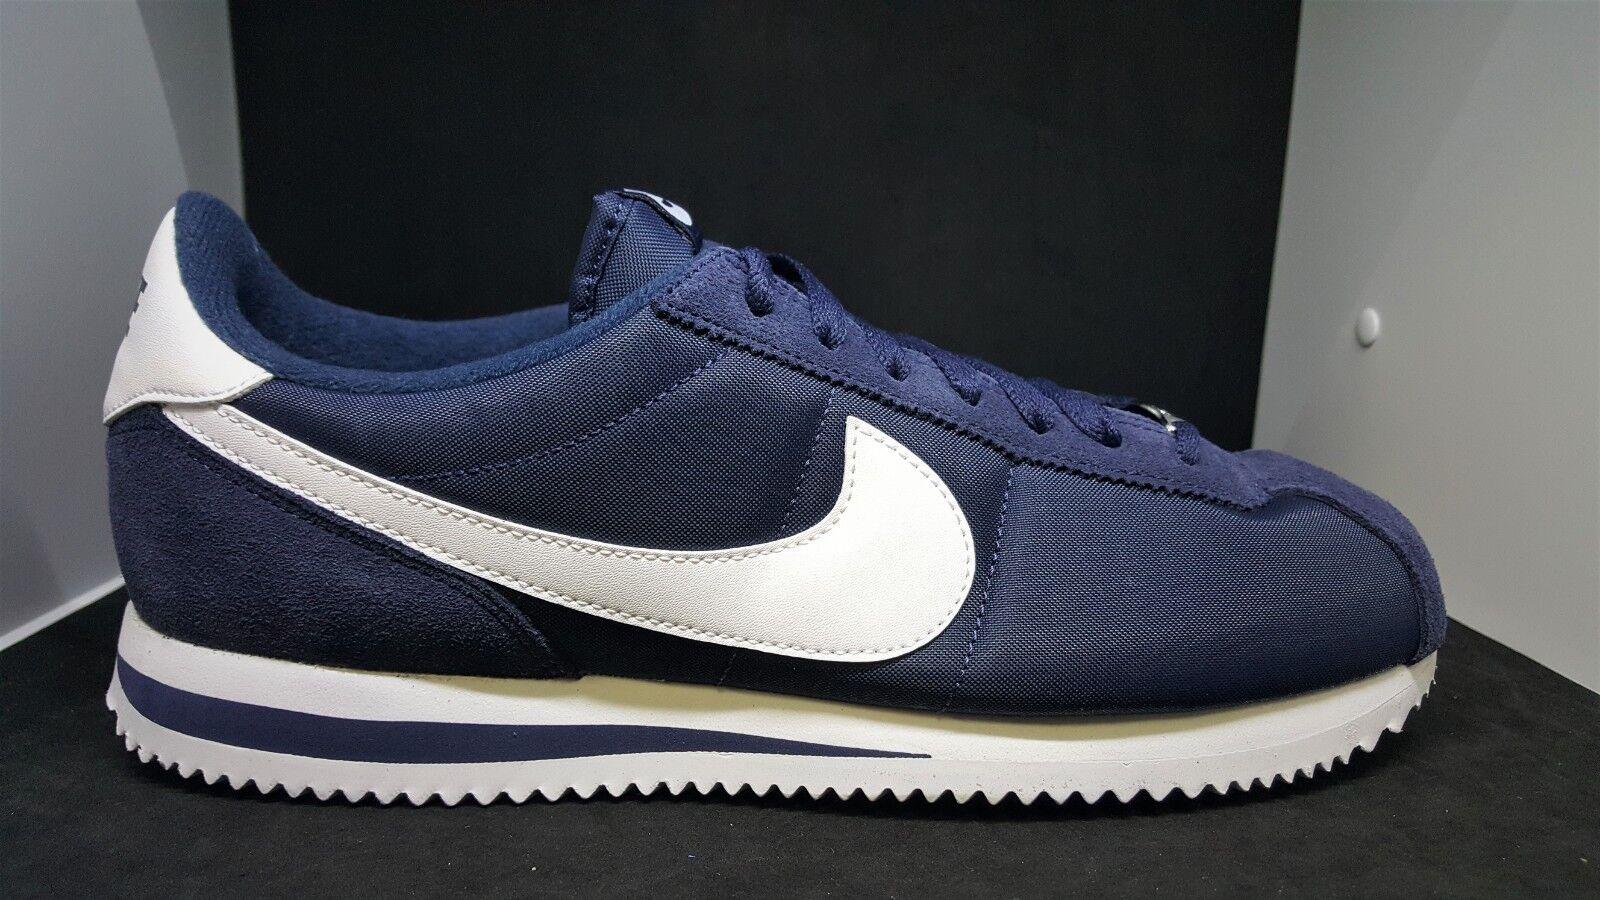 Nike Cortez Basic Nylon Obsidian White Men's Running shoes 819720-411 Size 10